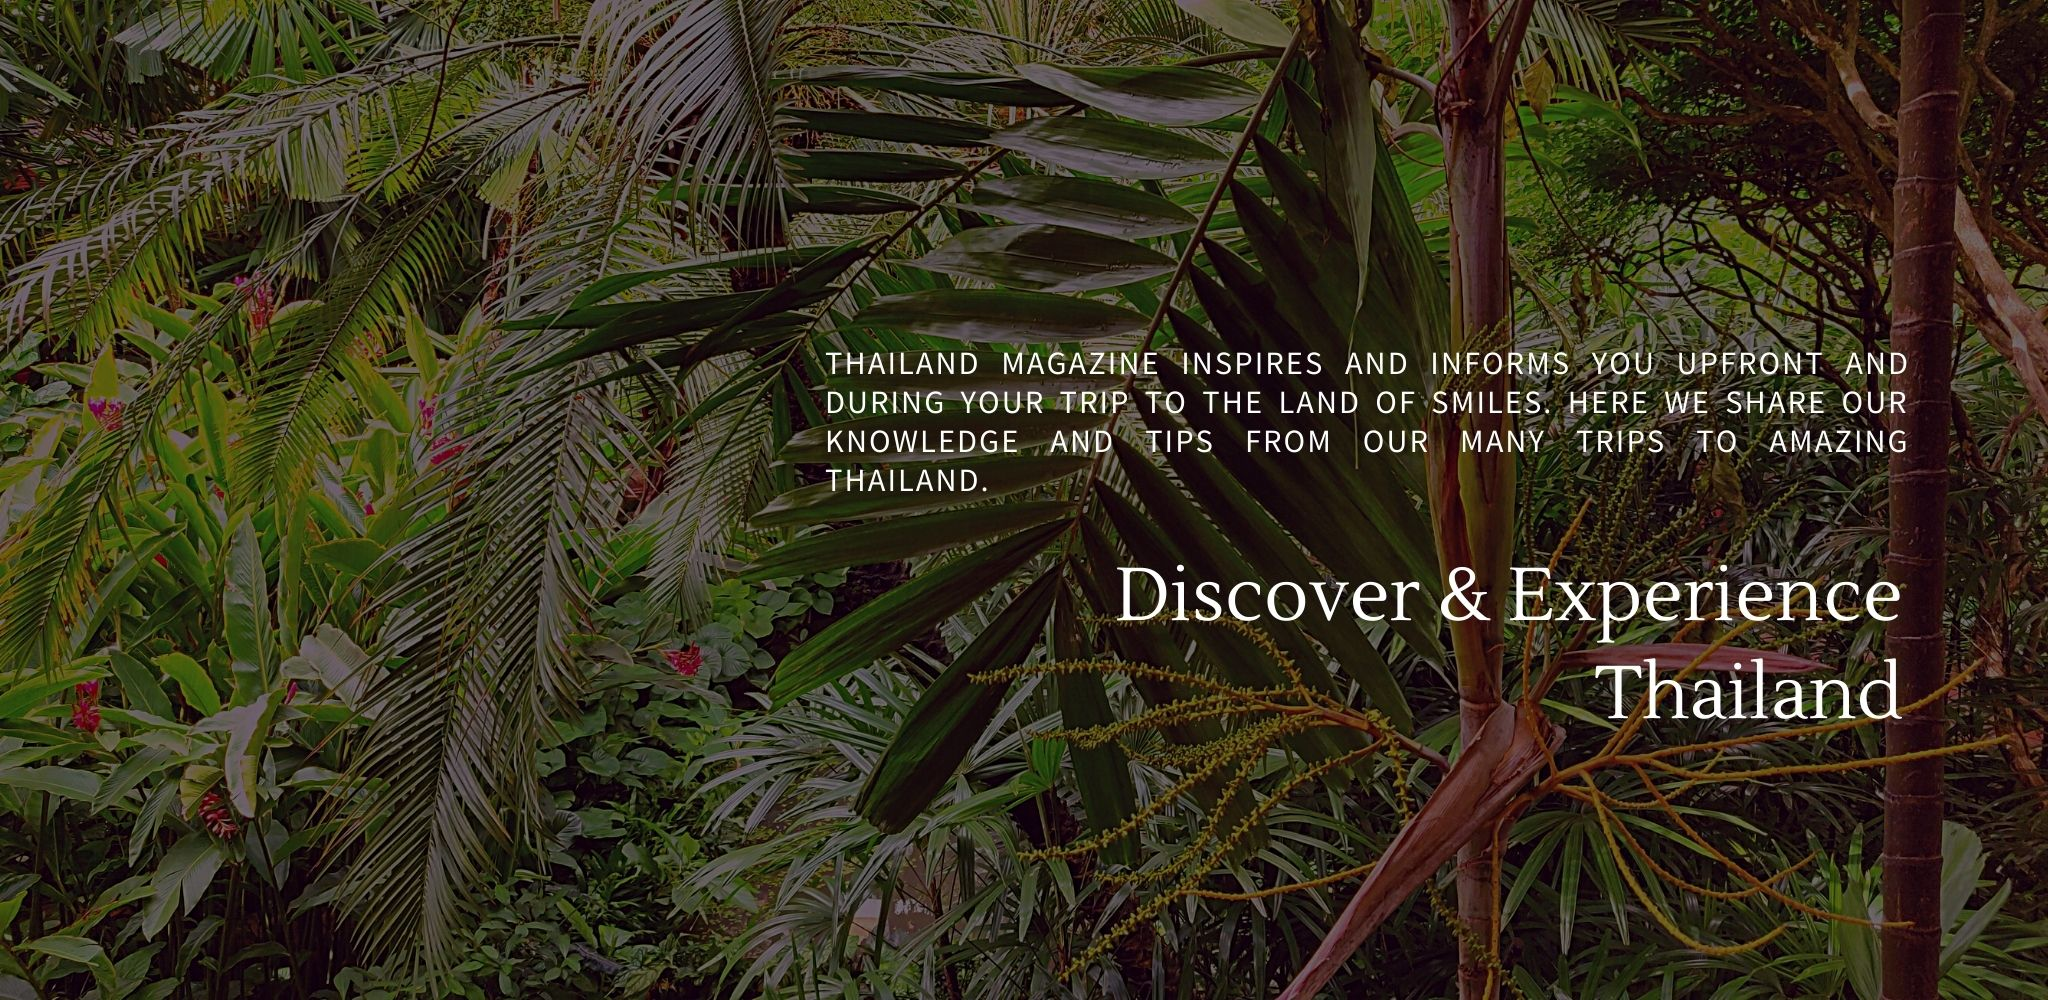 Thailand Magazine - Discover & Experience Thailand